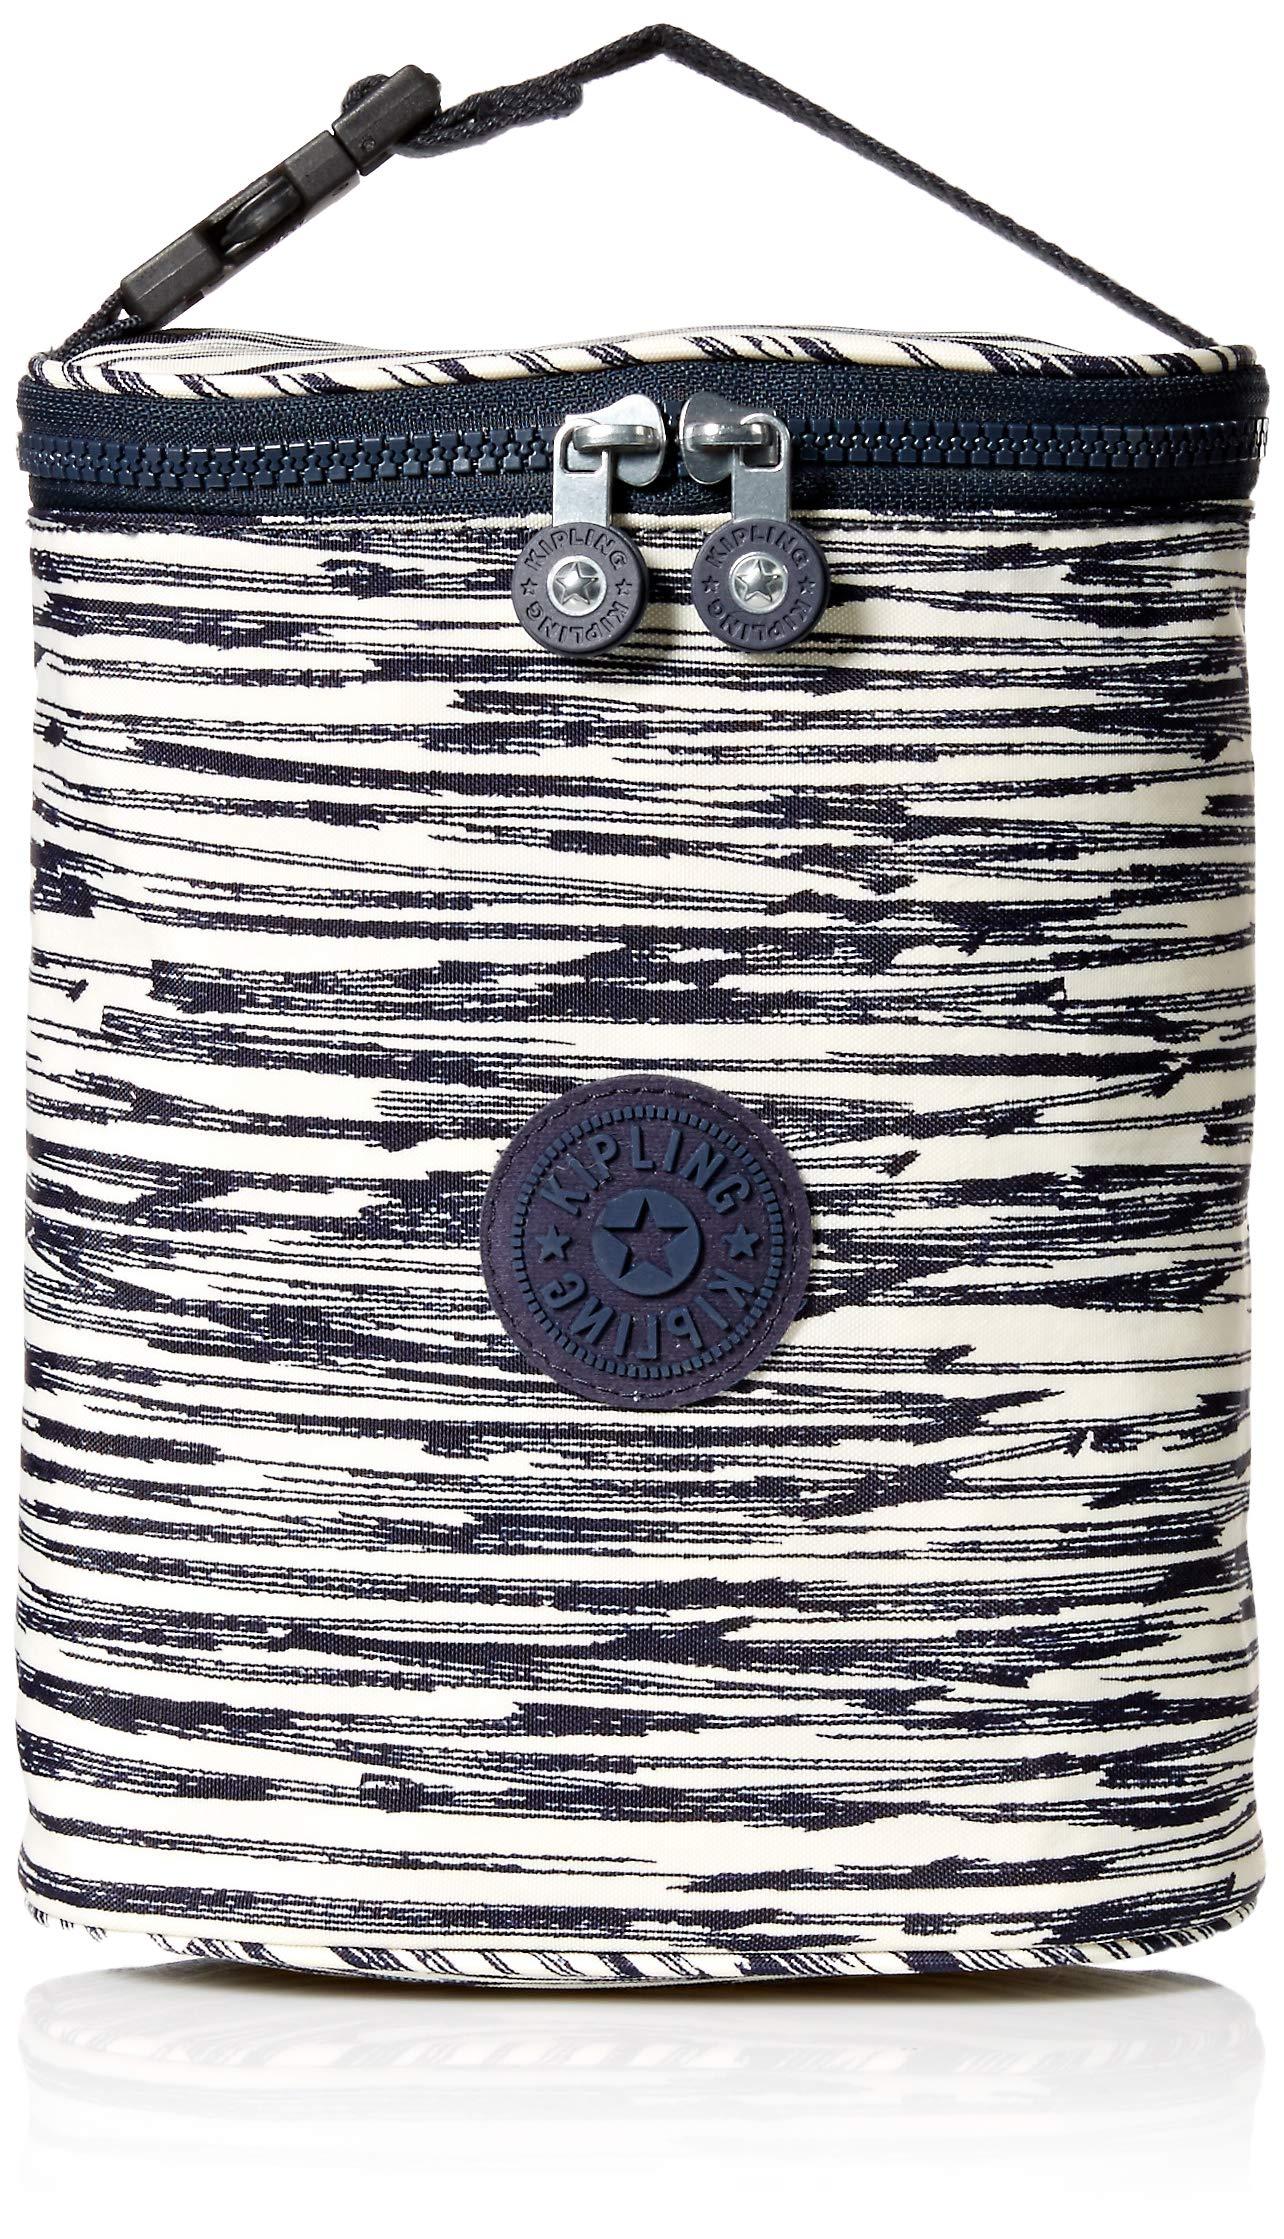 Kipling Women's Insulated Baby Bottle Holder, Clip On Strap, Black, scribble lines blue by Kipling